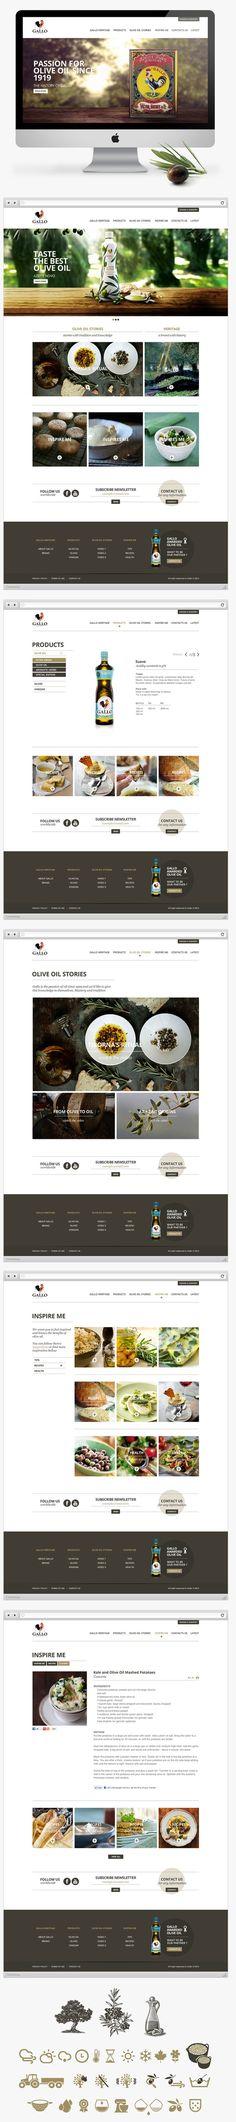 Creative #Hotel #Restaurant #Webdesign | #webdesign #it #web #design #layout #userinterface #website #webdesign